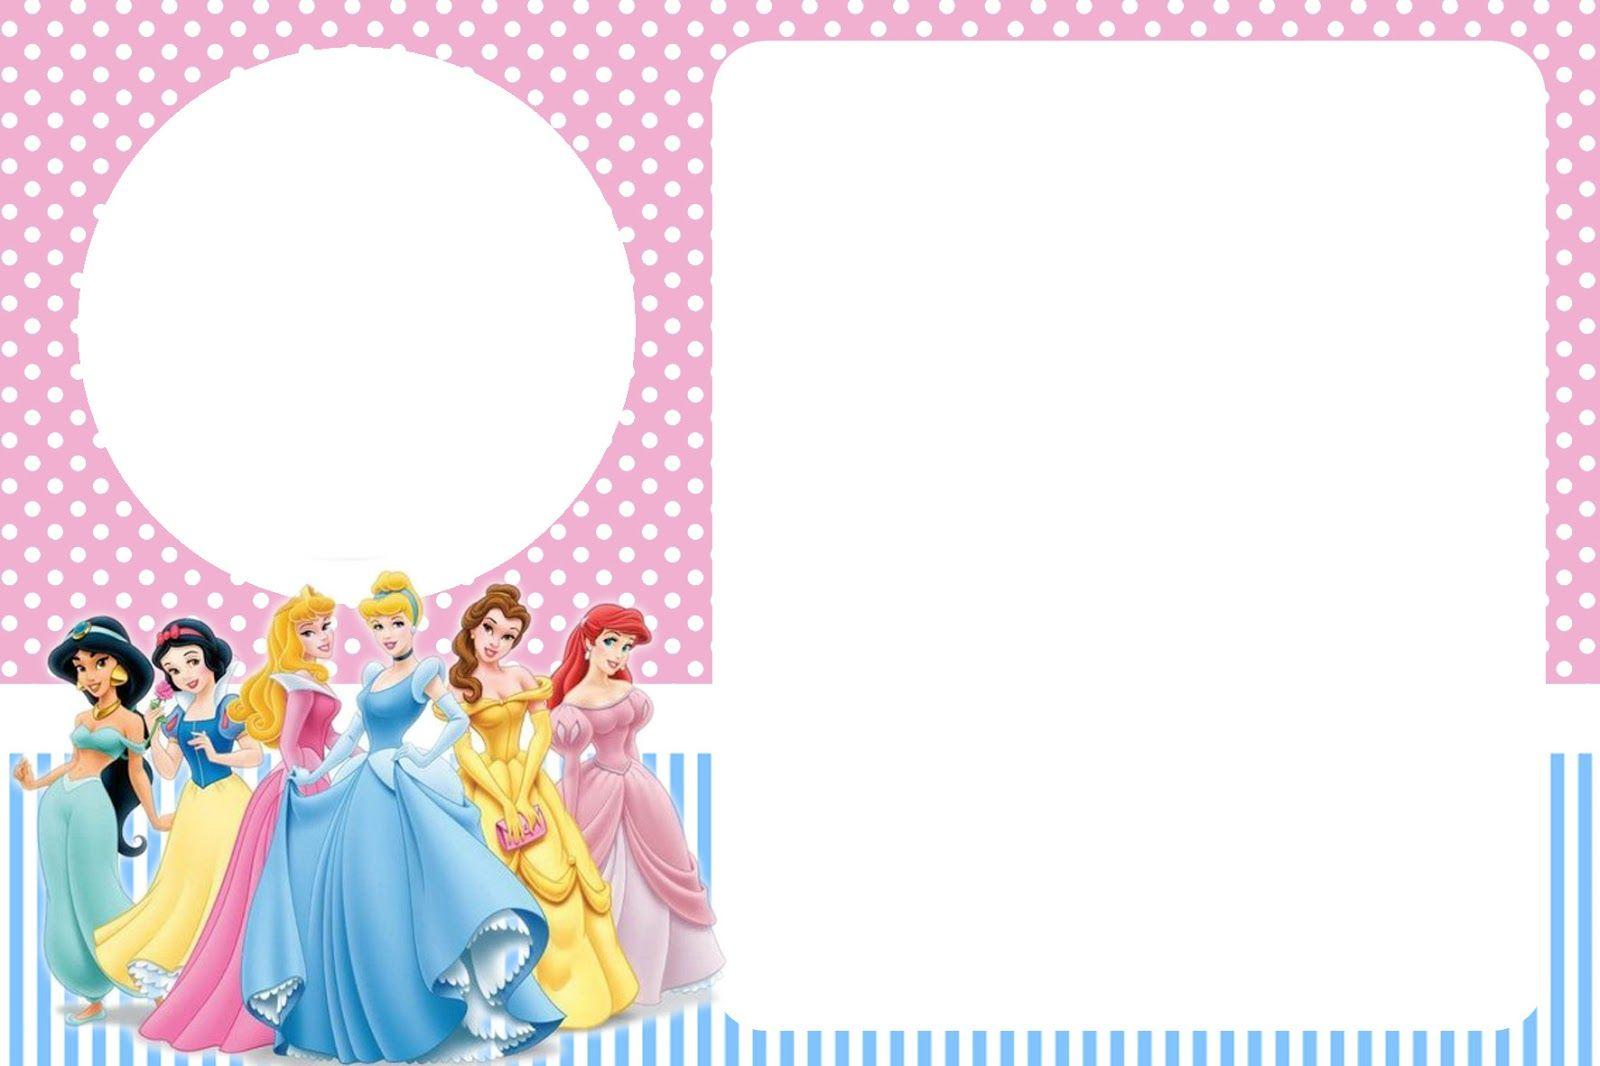 Convite3 Jpg 1600 1066 Convite Princesa Aniversario Com Tema